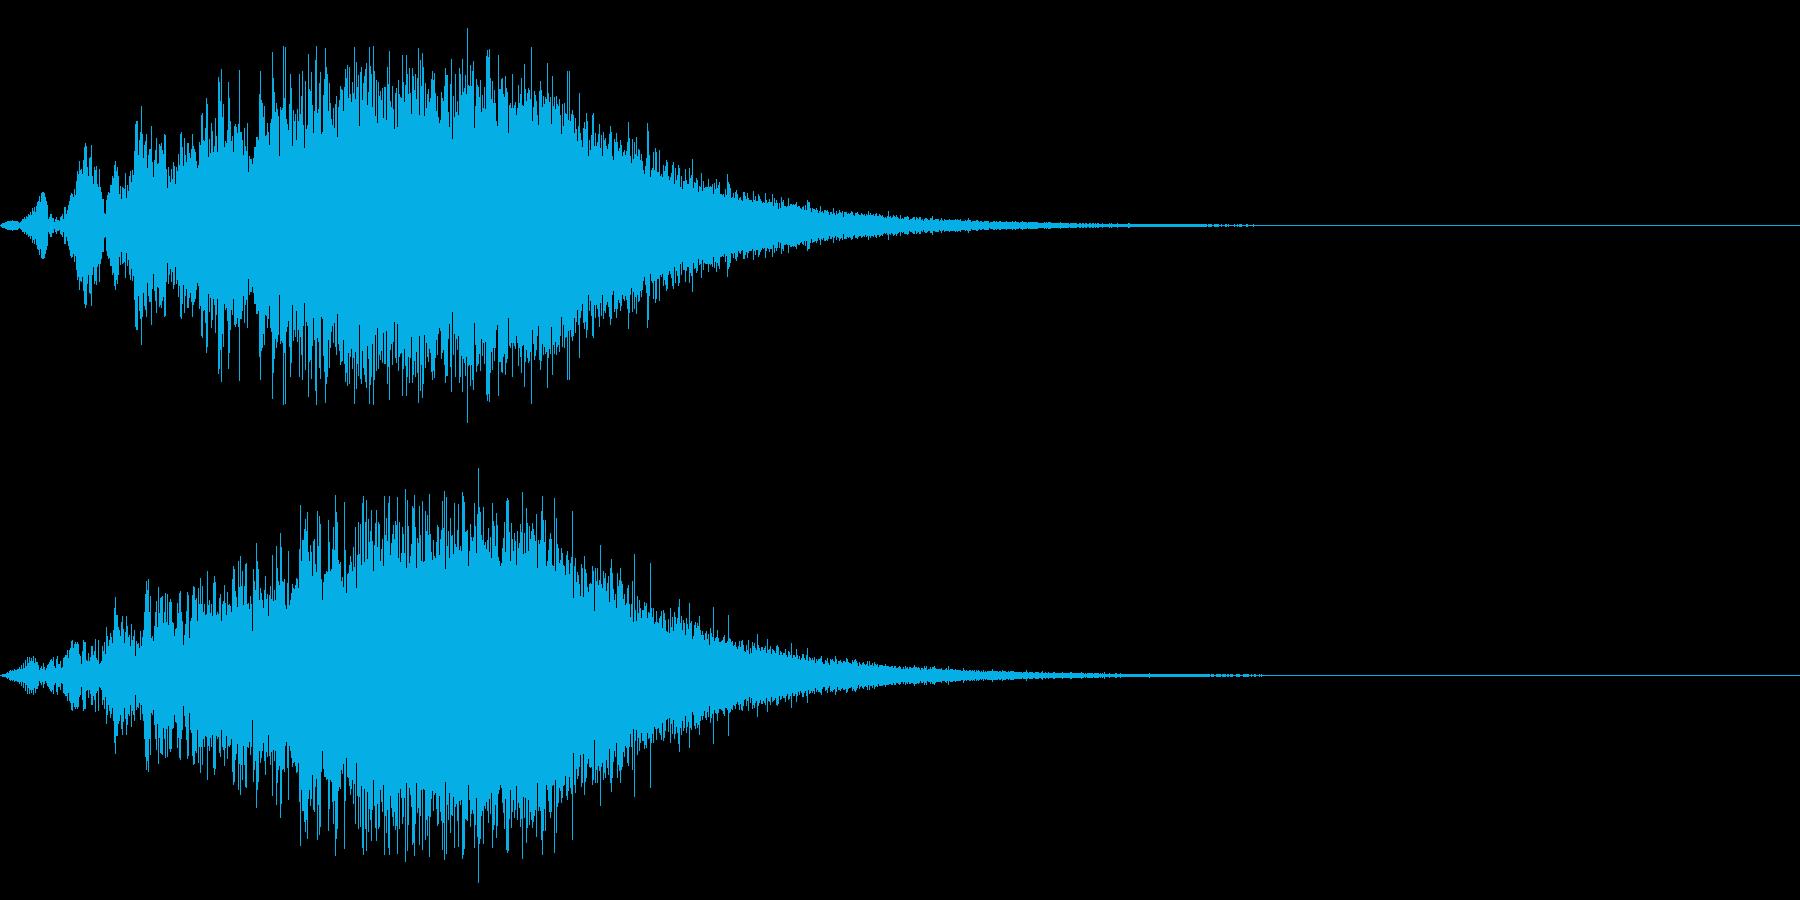 Dark_SweepUp-02Delayの再生済みの波形